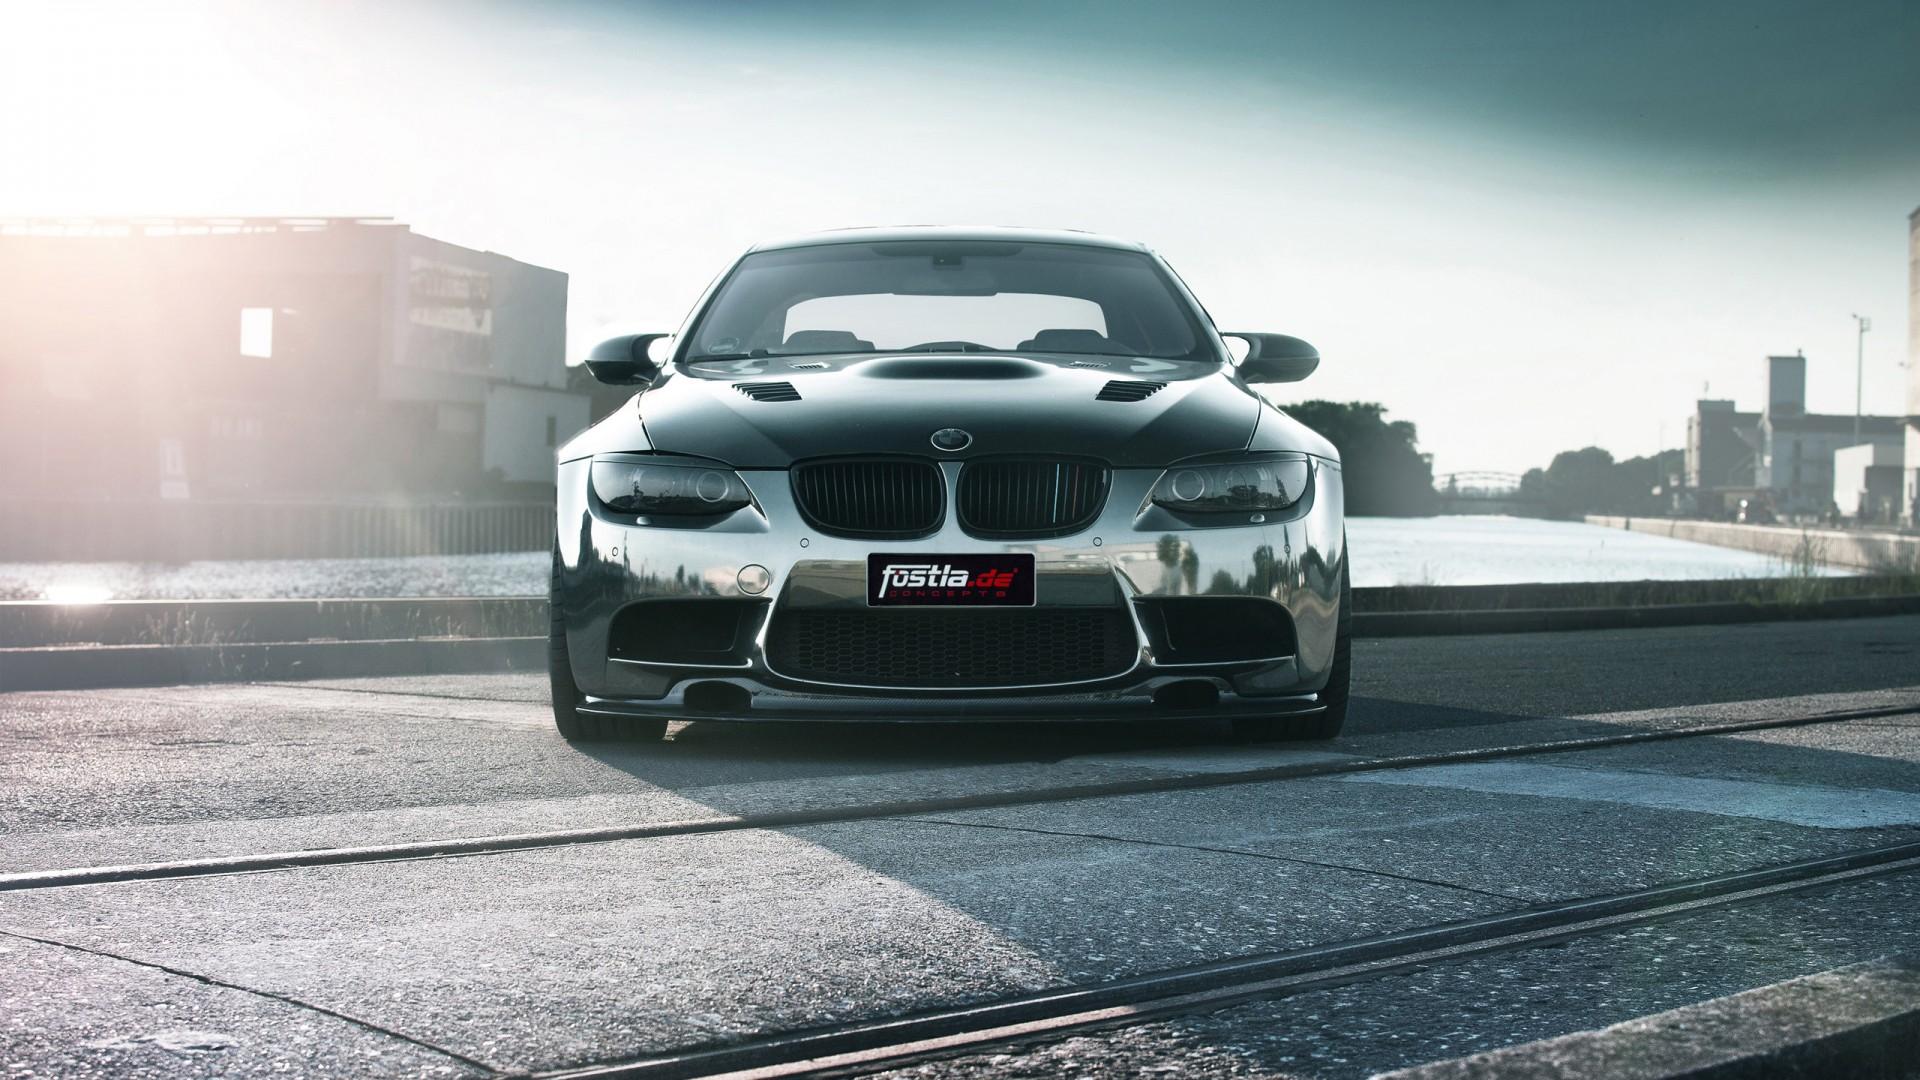 Alfa Romeo Cars Hd Wallpapers 2016 Fostla De Bmw M3 Coupe Wallpaper Hd Car Wallpapers